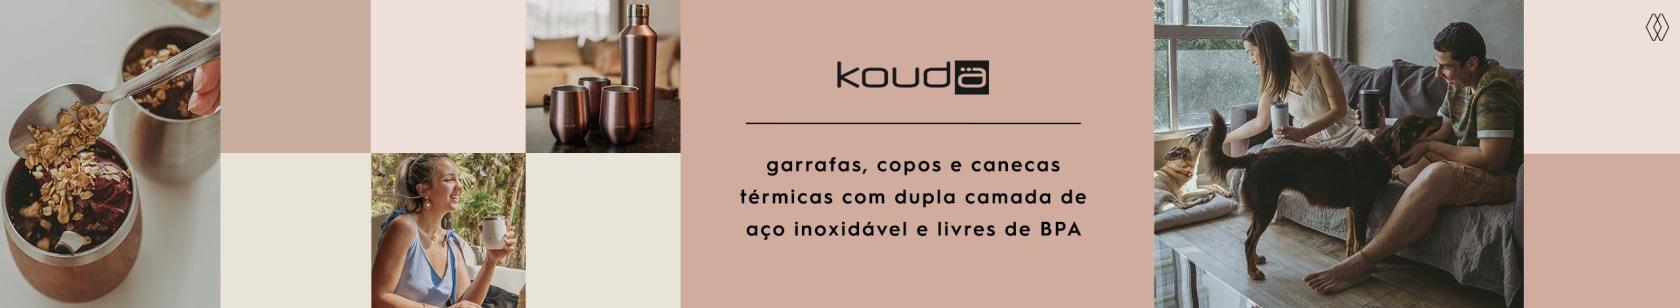 KOUDA | AMARO